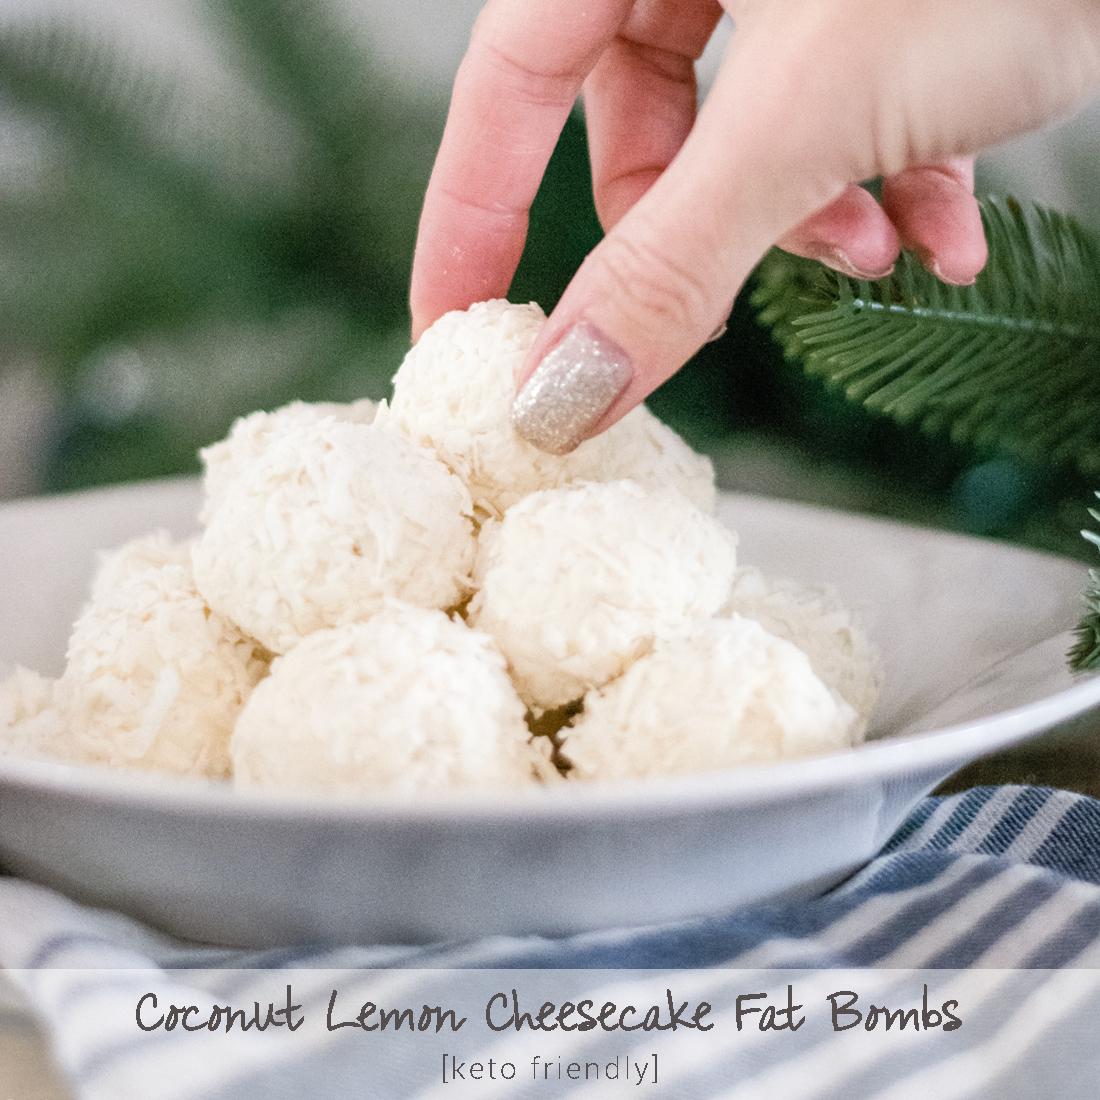 Sugar Free Low Carb Coconut Lemon Cheesecake Keto Fat Bombs